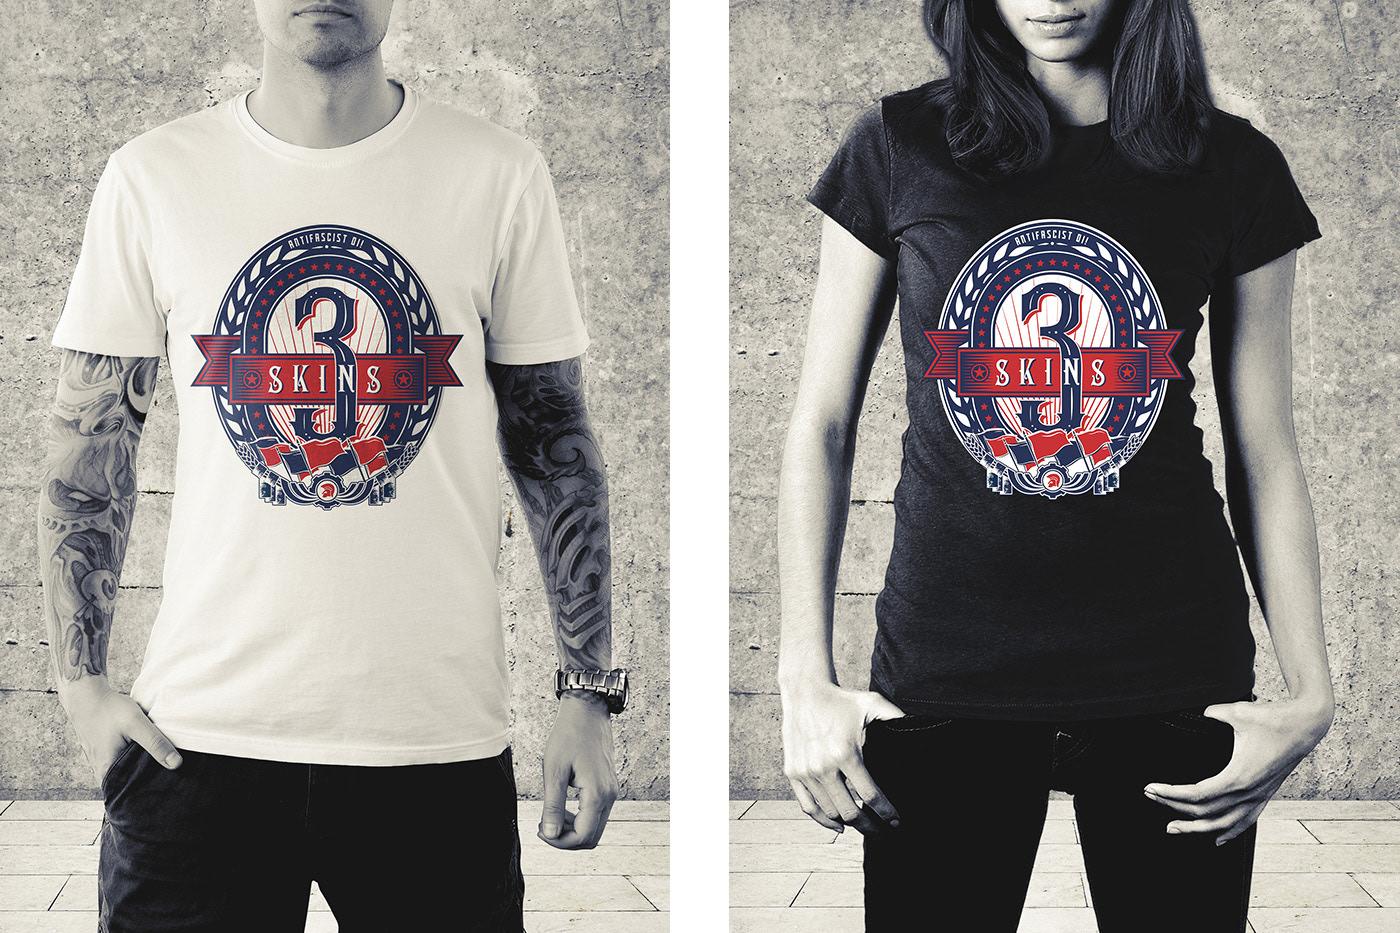 scaffolding industrie shirt shirtesign vintage Vintage Design Retro rocknroll